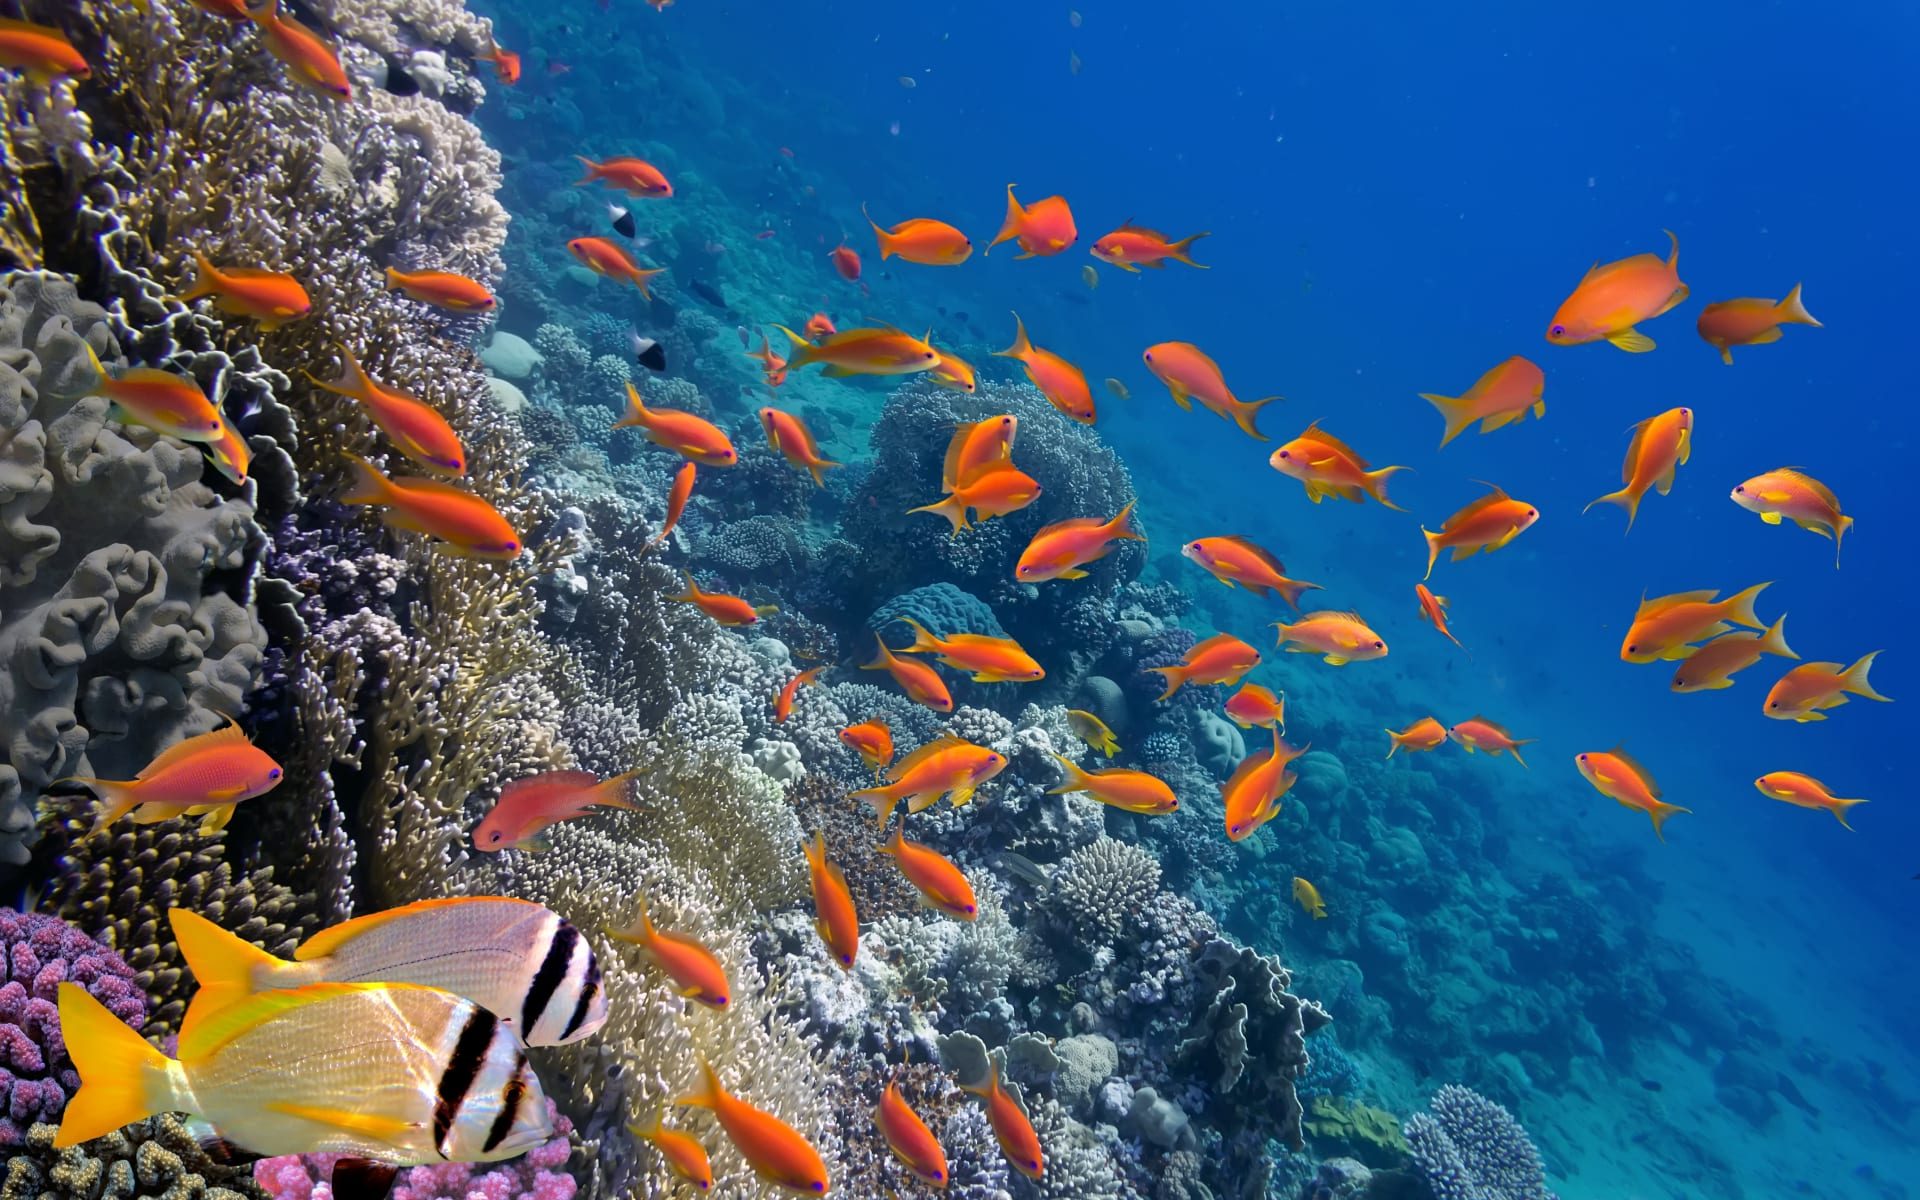 Badeferien im JAZ Lamaya Resort ab Marsa Alam: Fische Marsa Alam